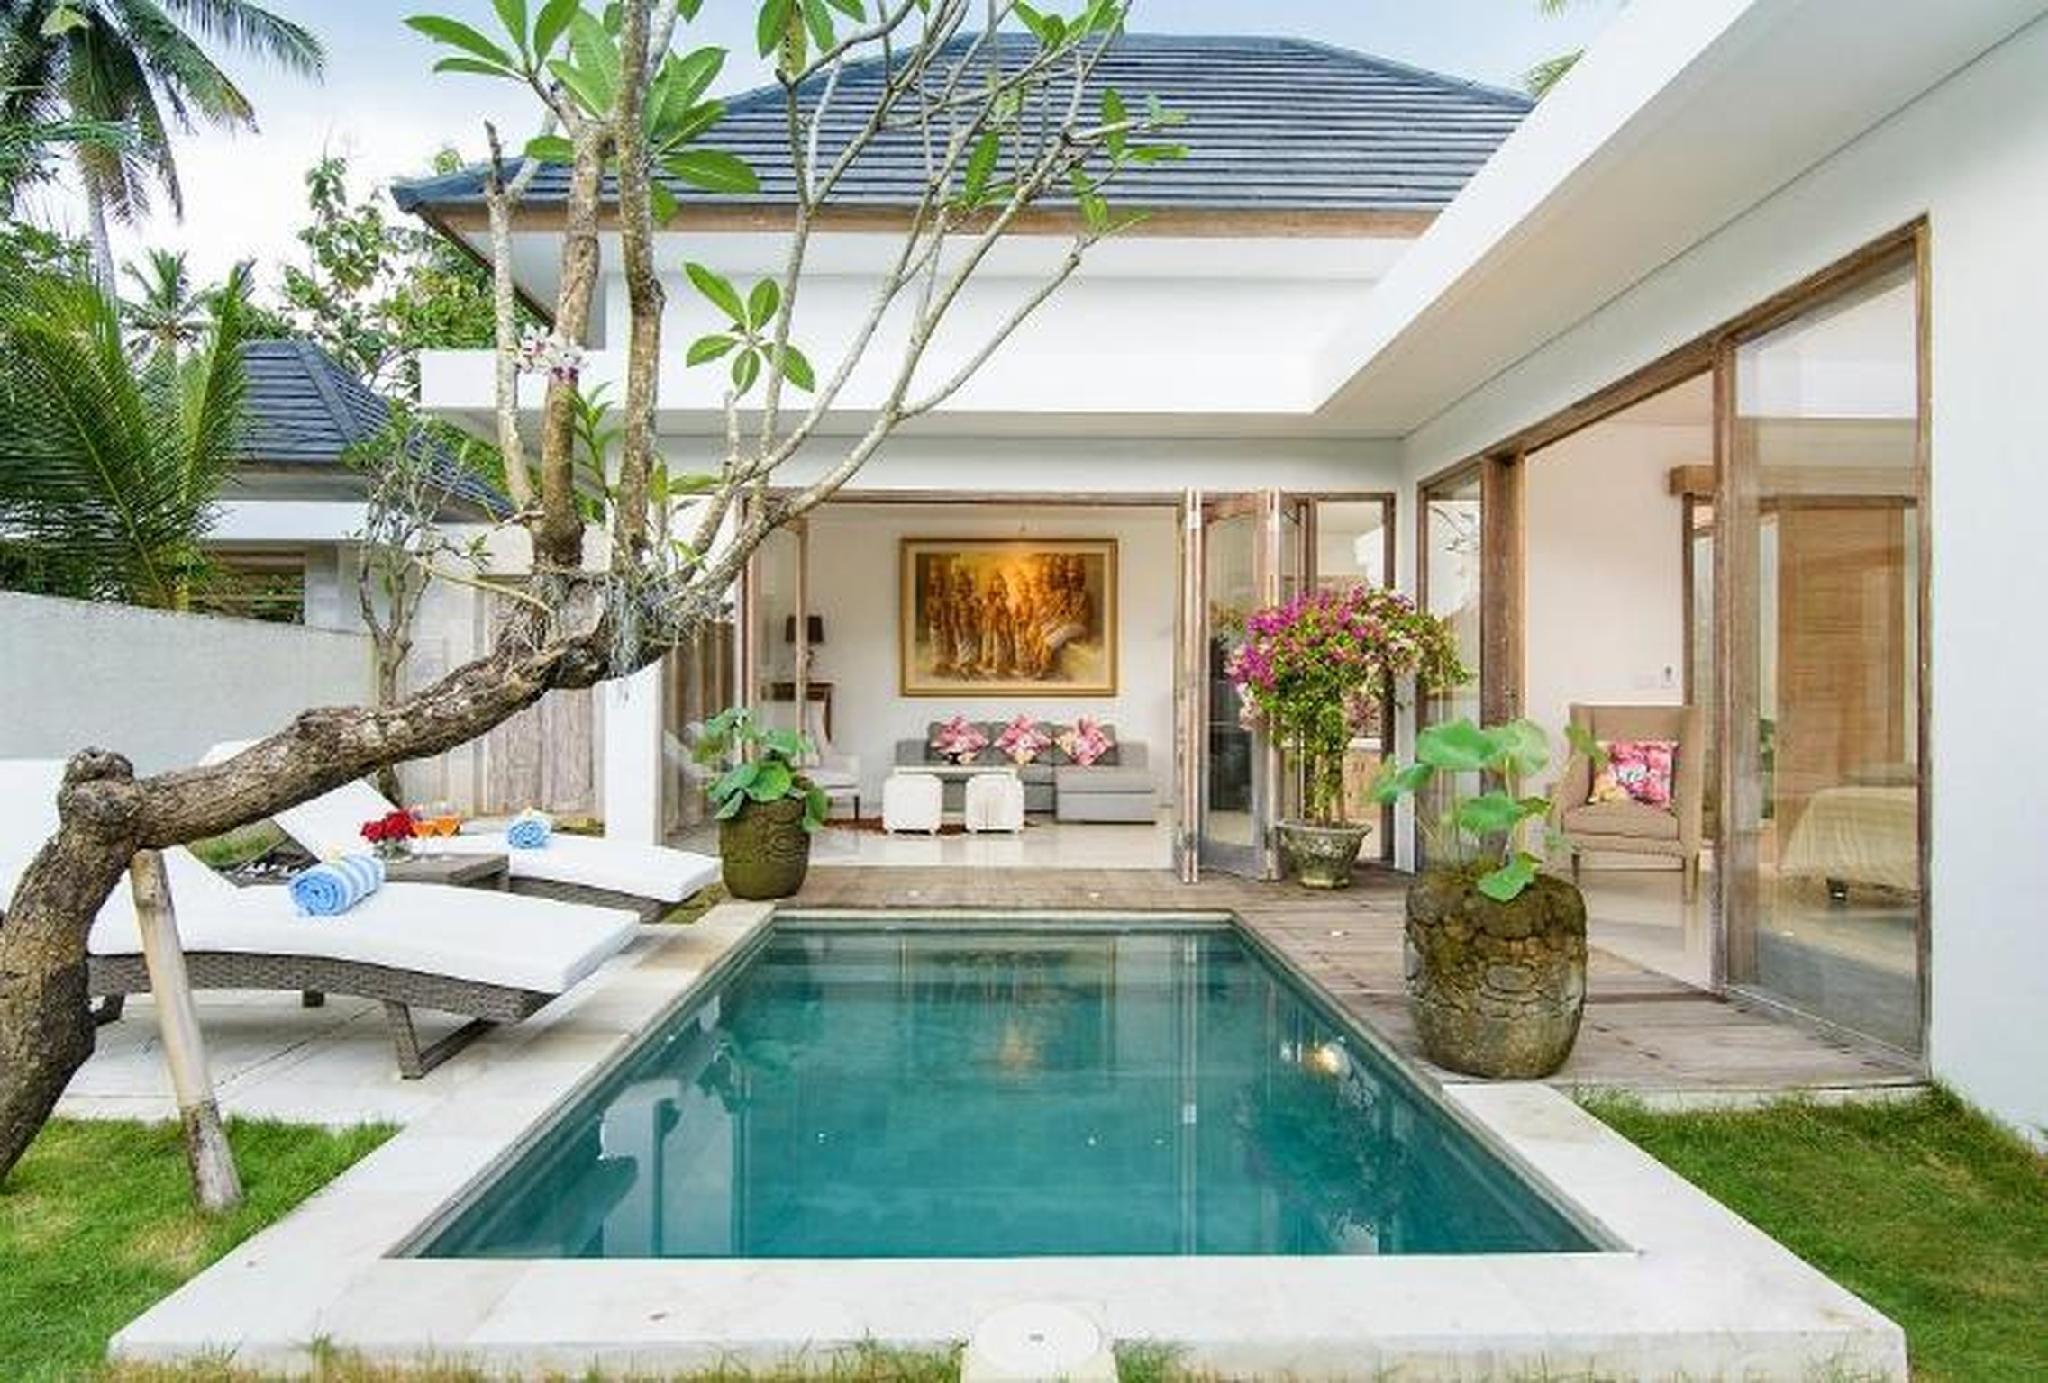 1 BDR Honeymoon Villa At Pekutatan West Bali